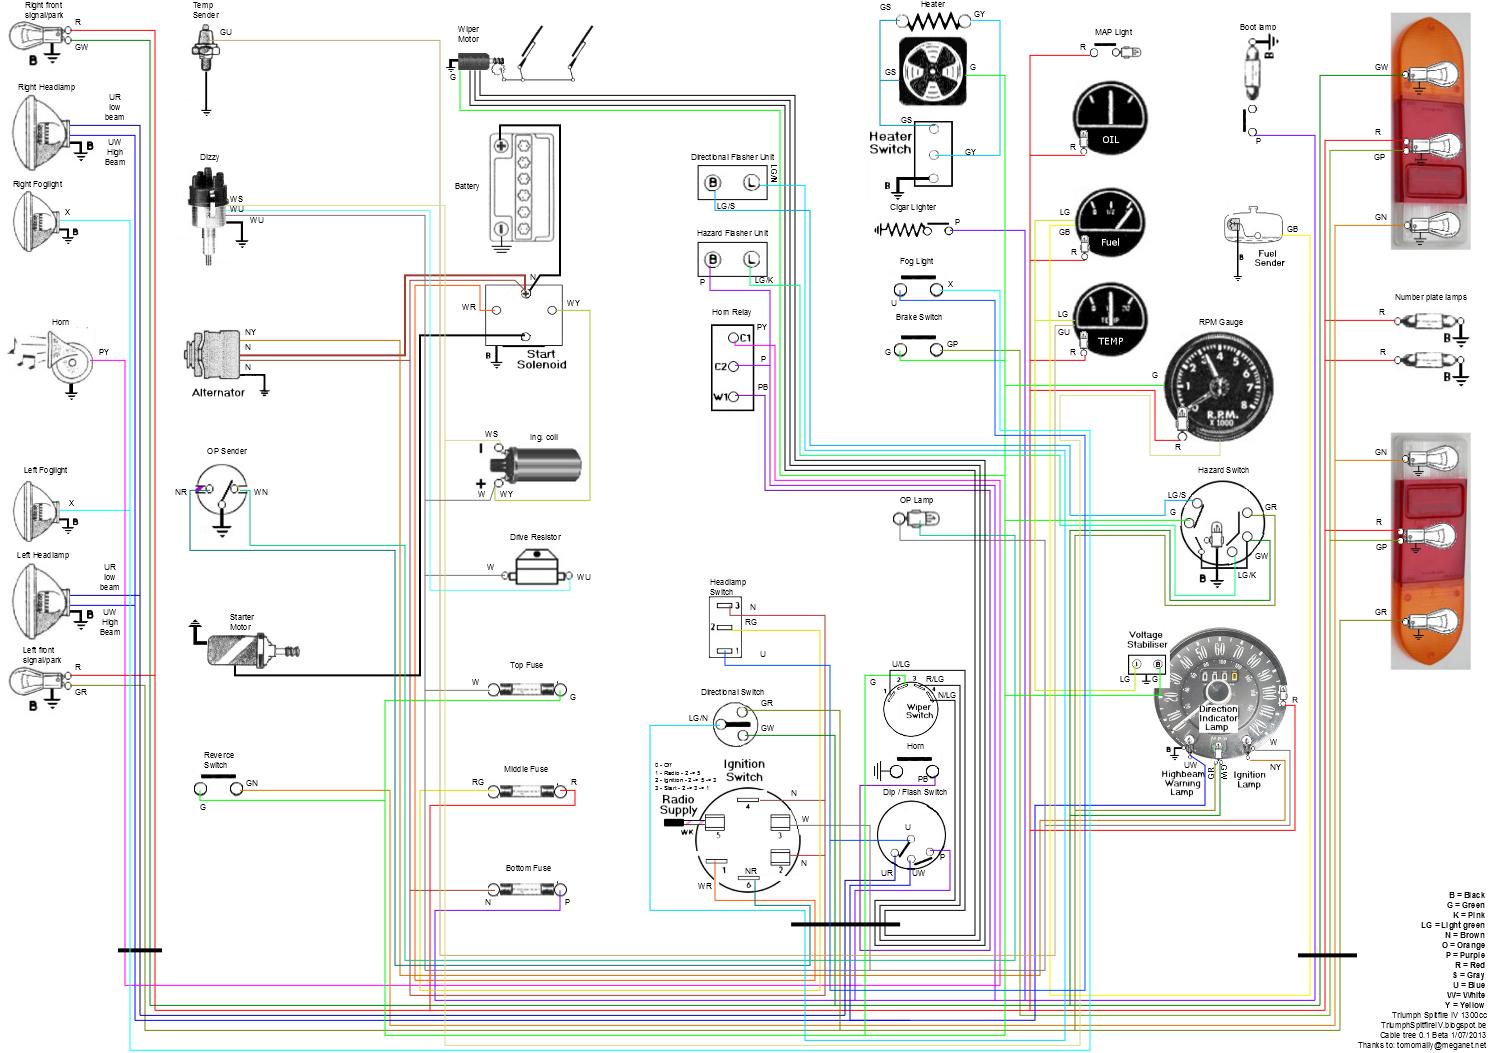 Spitfire MkIV Wiring Diagram | Triumph spitfire, Triumph, Fuse box Pinterest